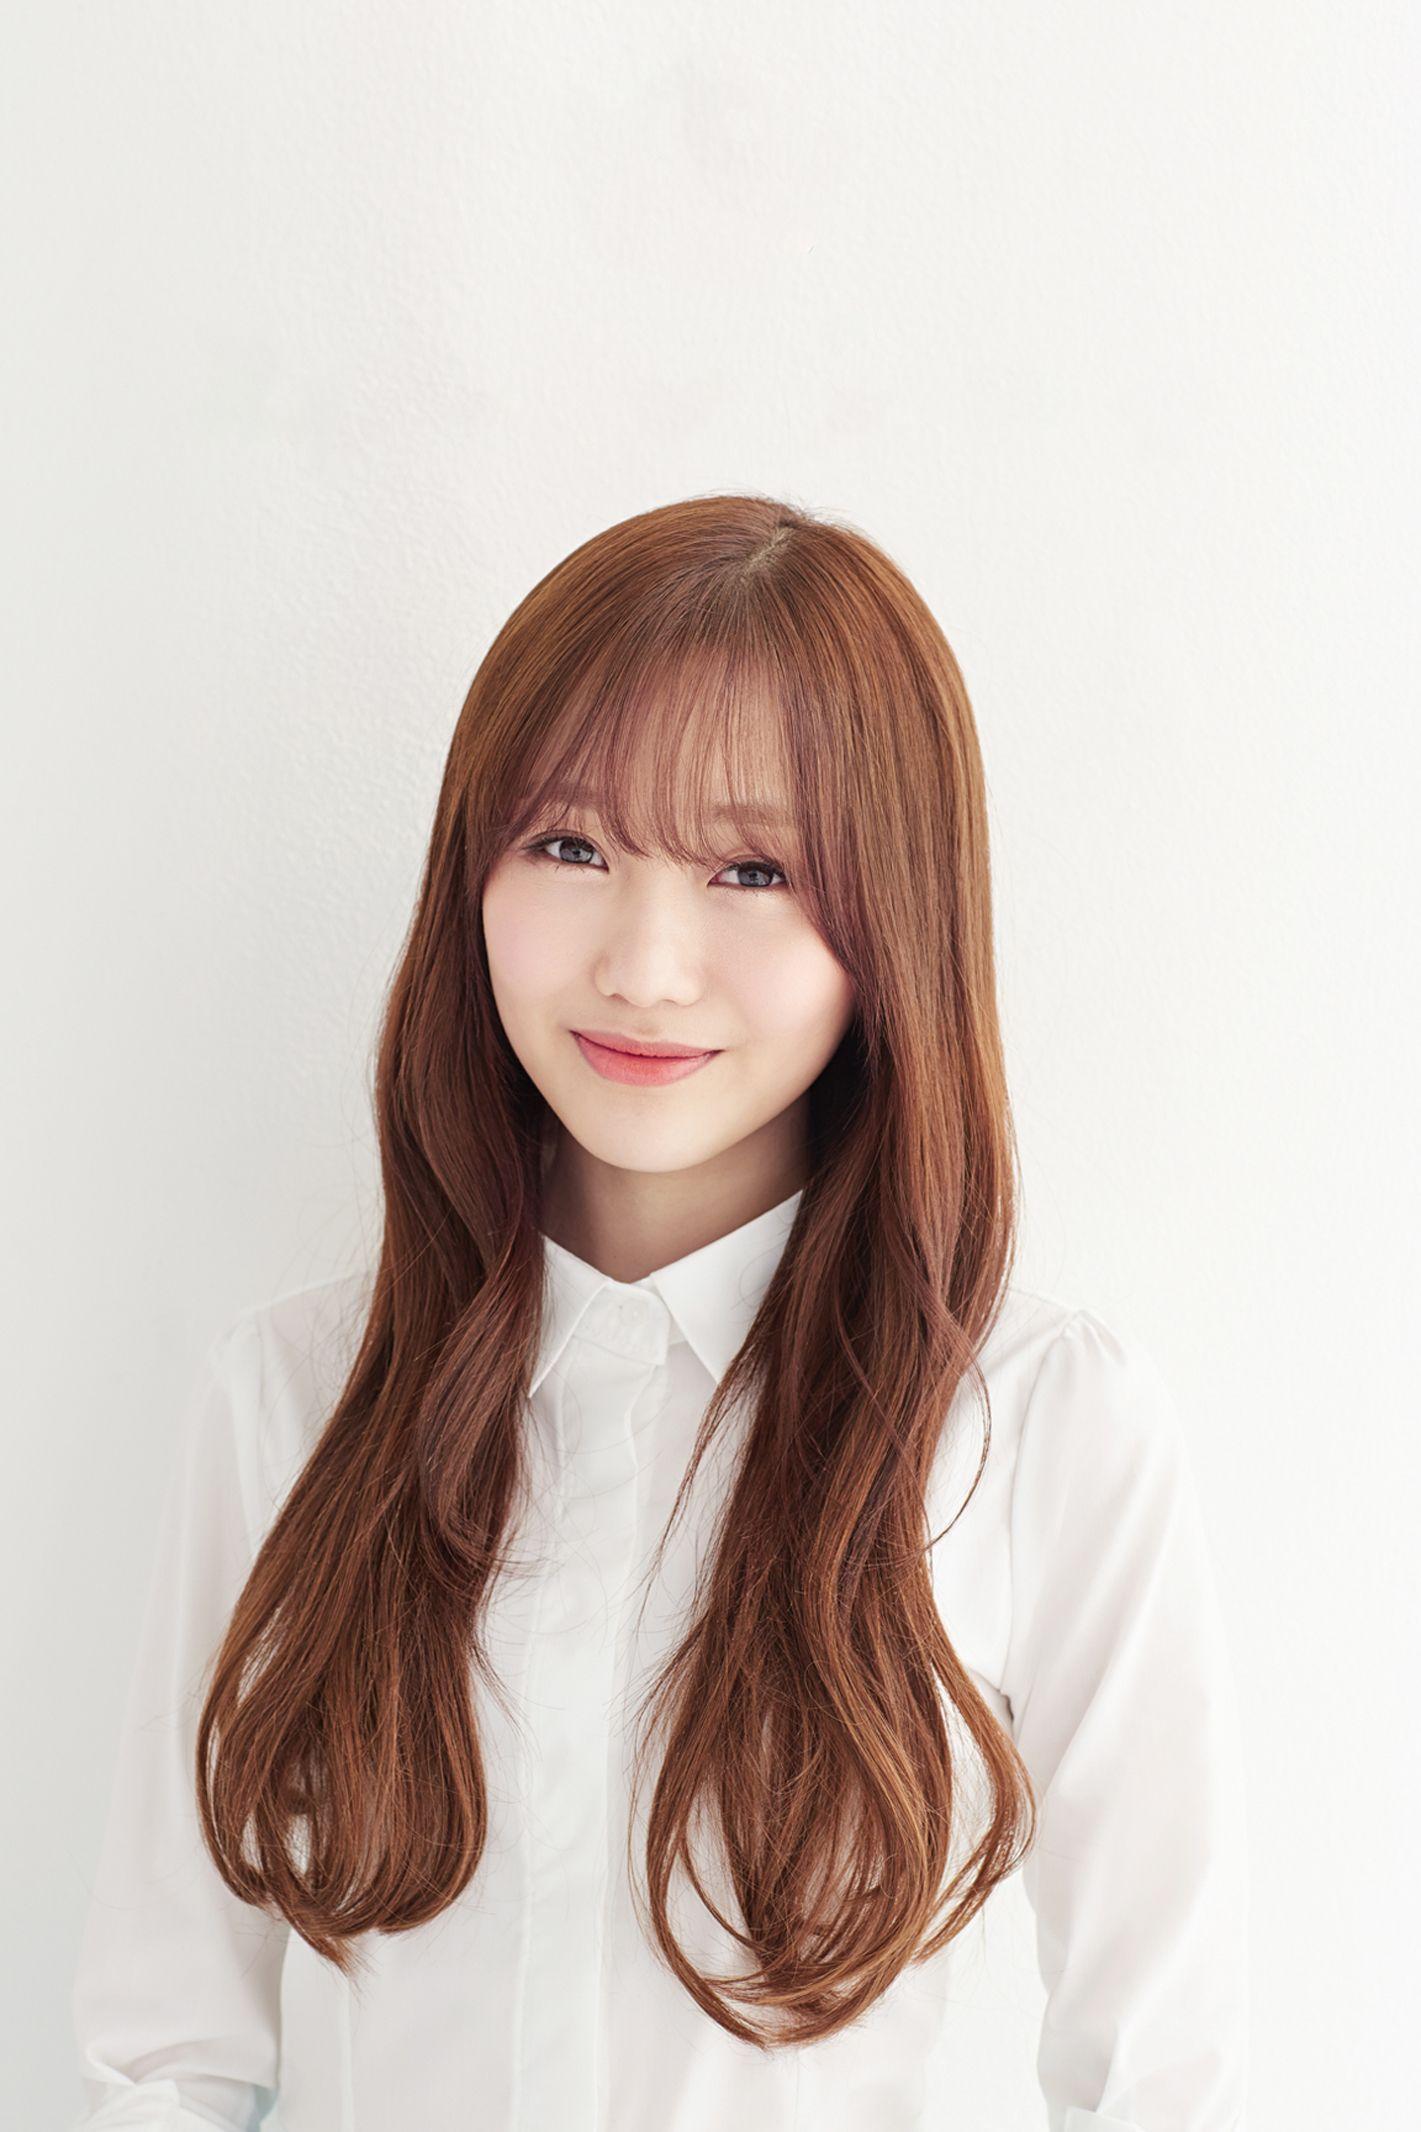 Cringiest Makeup Tutorials Of All Time: Kpop, Asian Girl, Kpop Hair